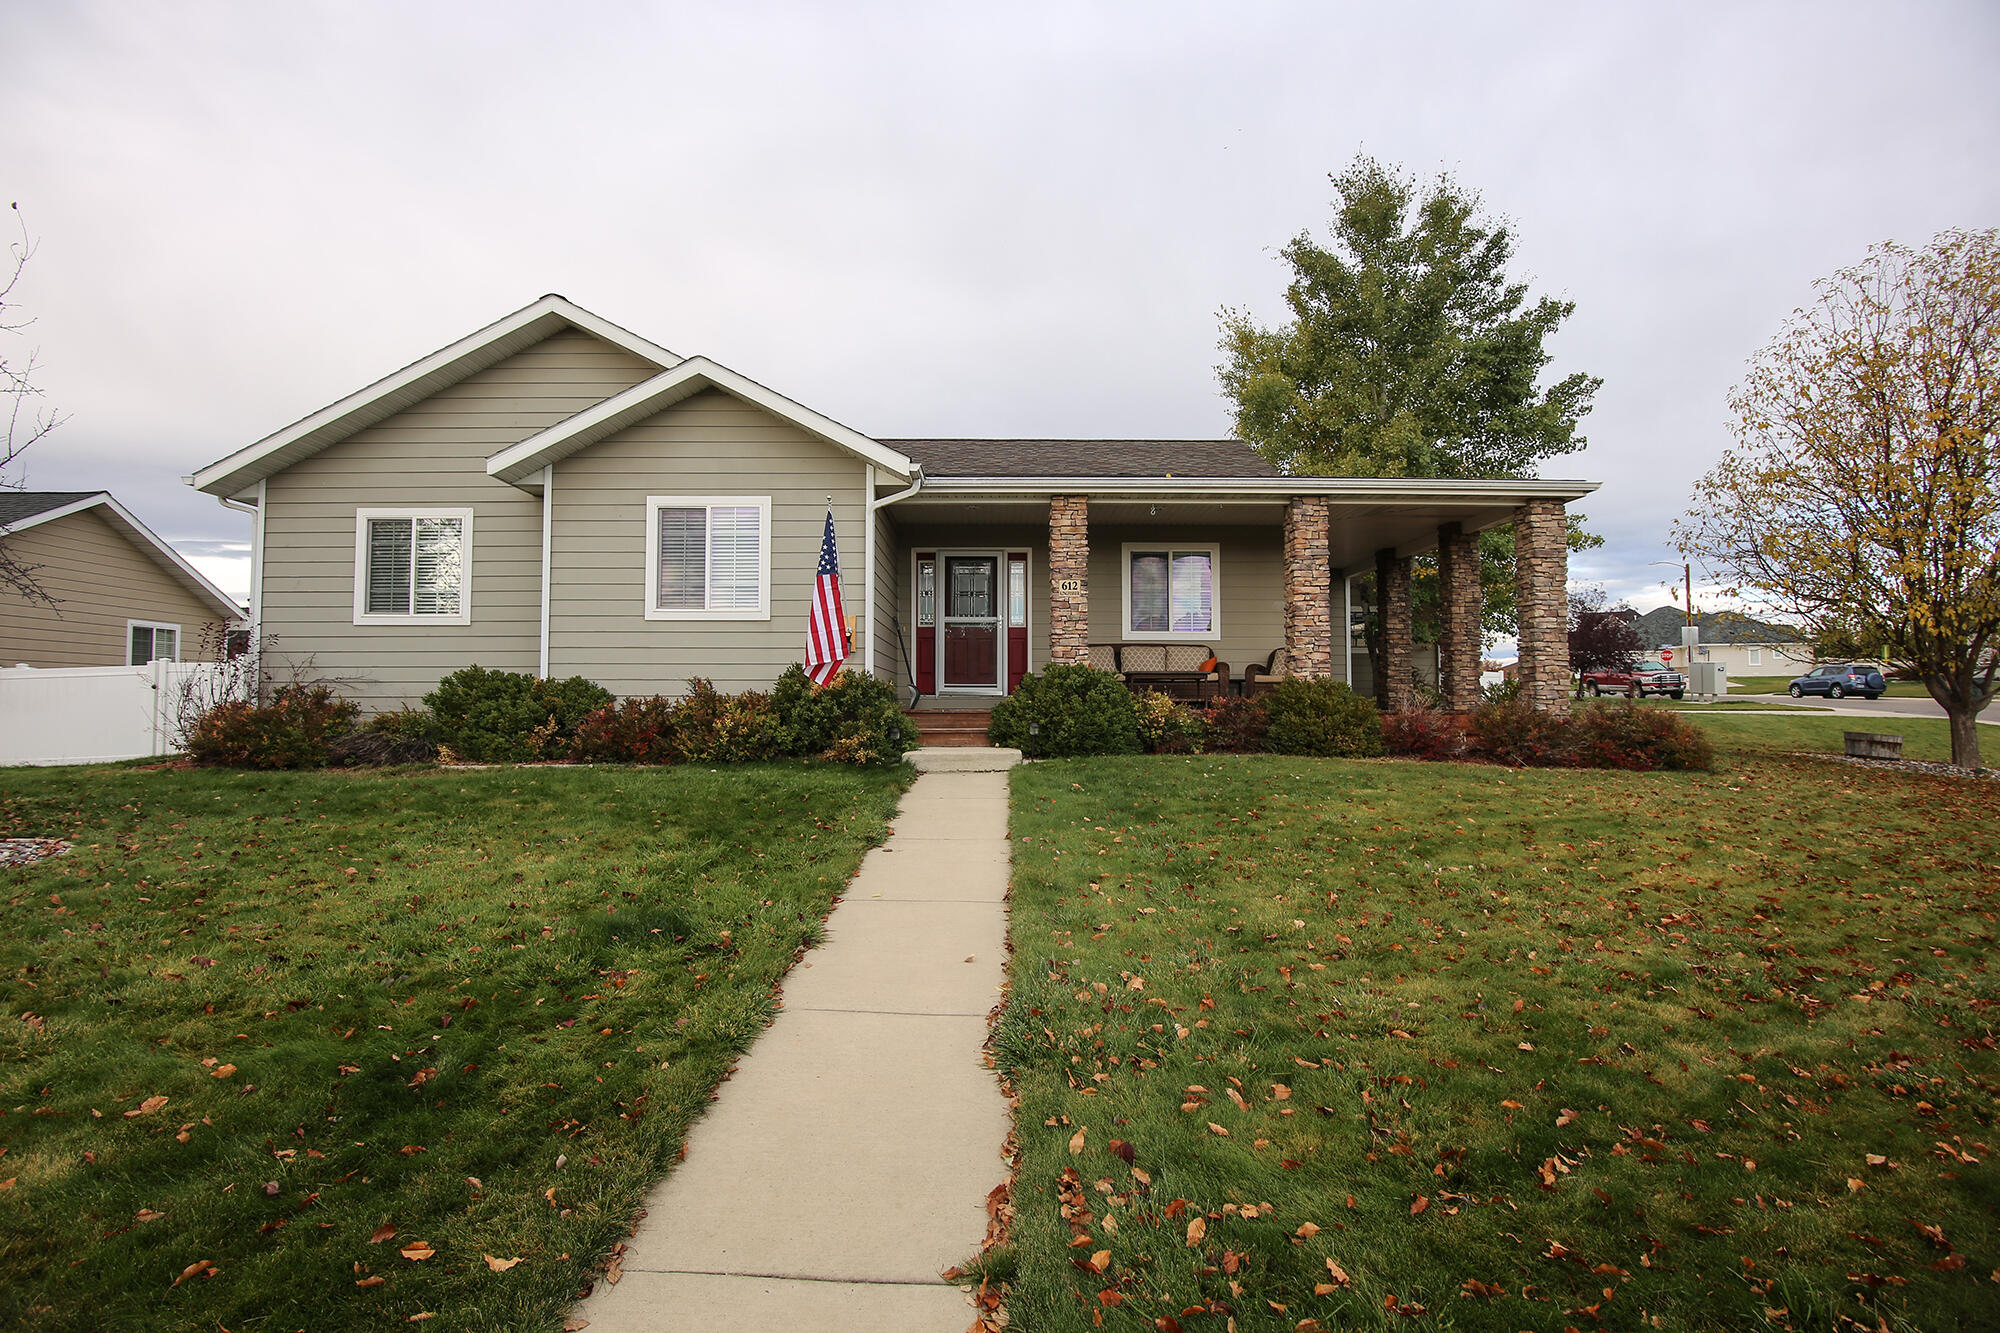 612 Kingfisher Avenue, Sheridan, Wyoming 82801, 3 Bedrooms Bedrooms, ,2.5 BathroomsBathrooms,Residential,For Sale,Kingfisher,21-1196